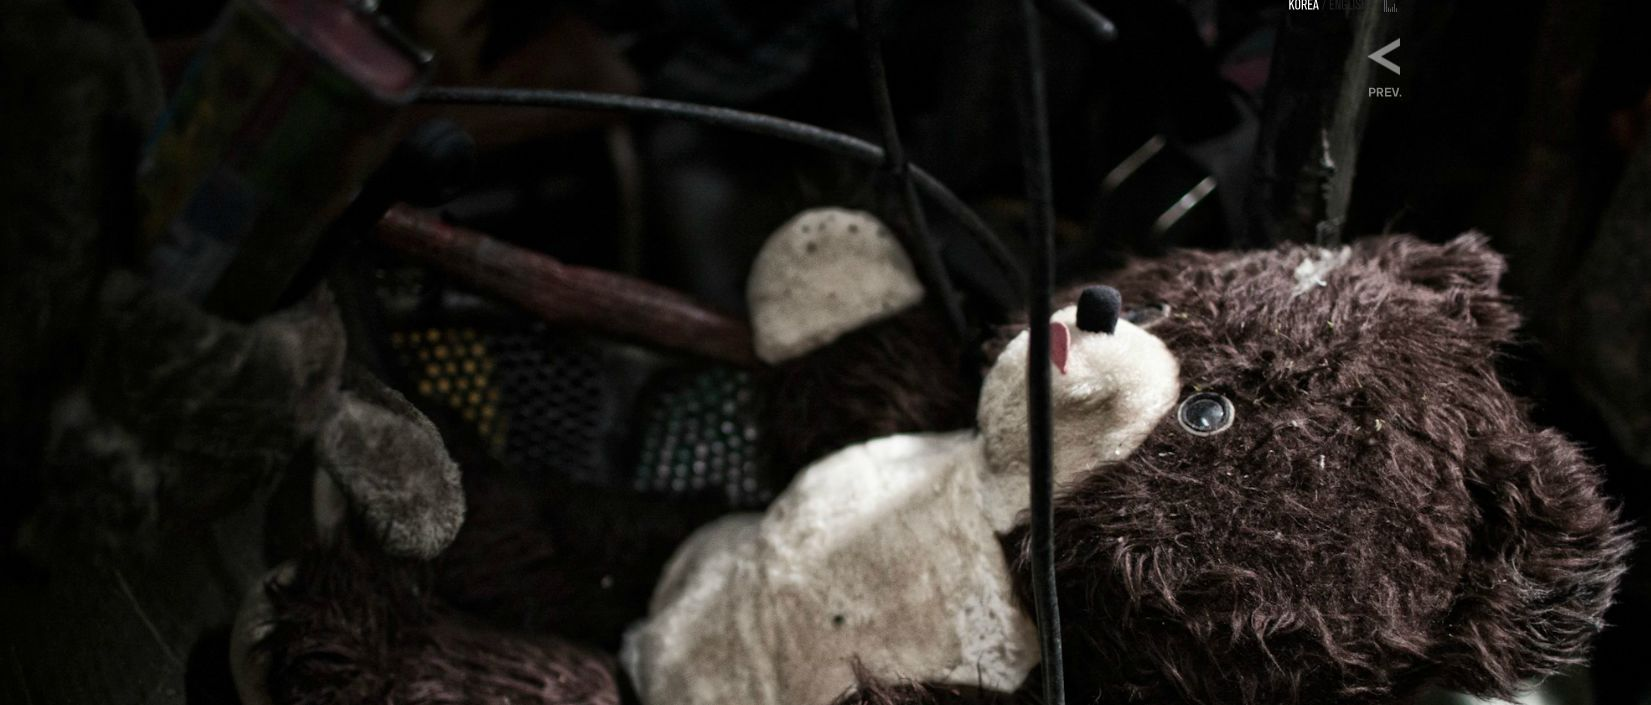 snowpiercer-teddy-bear.jpg